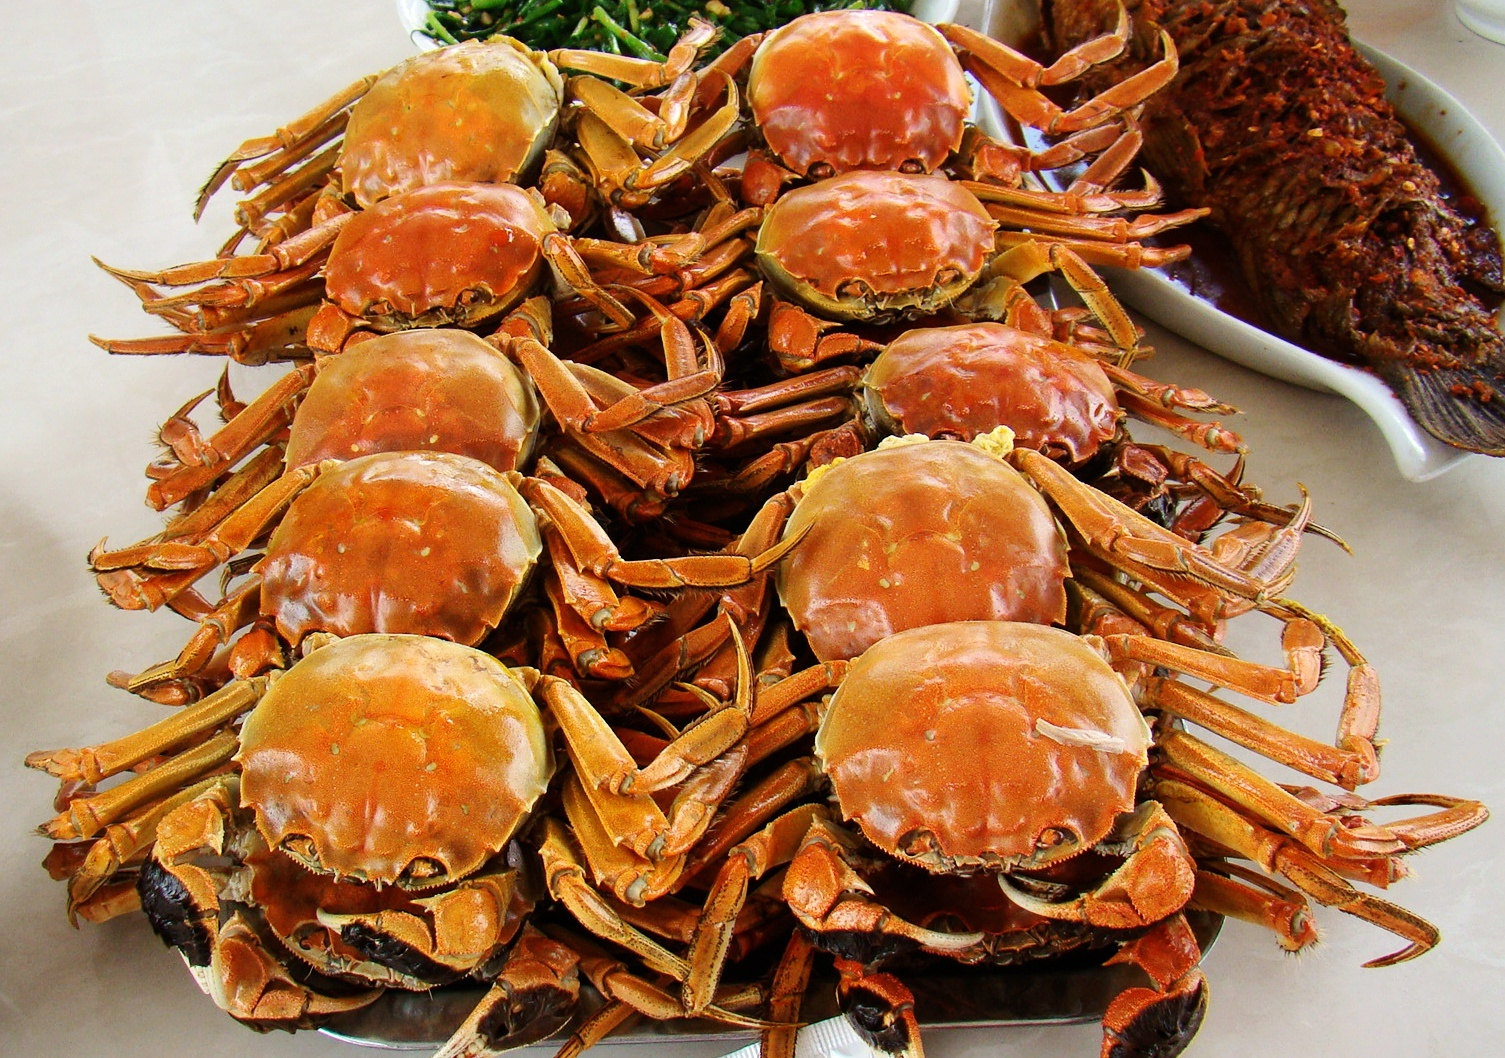 http://www.kmshsm.com/kunmingfangchan/68379.html